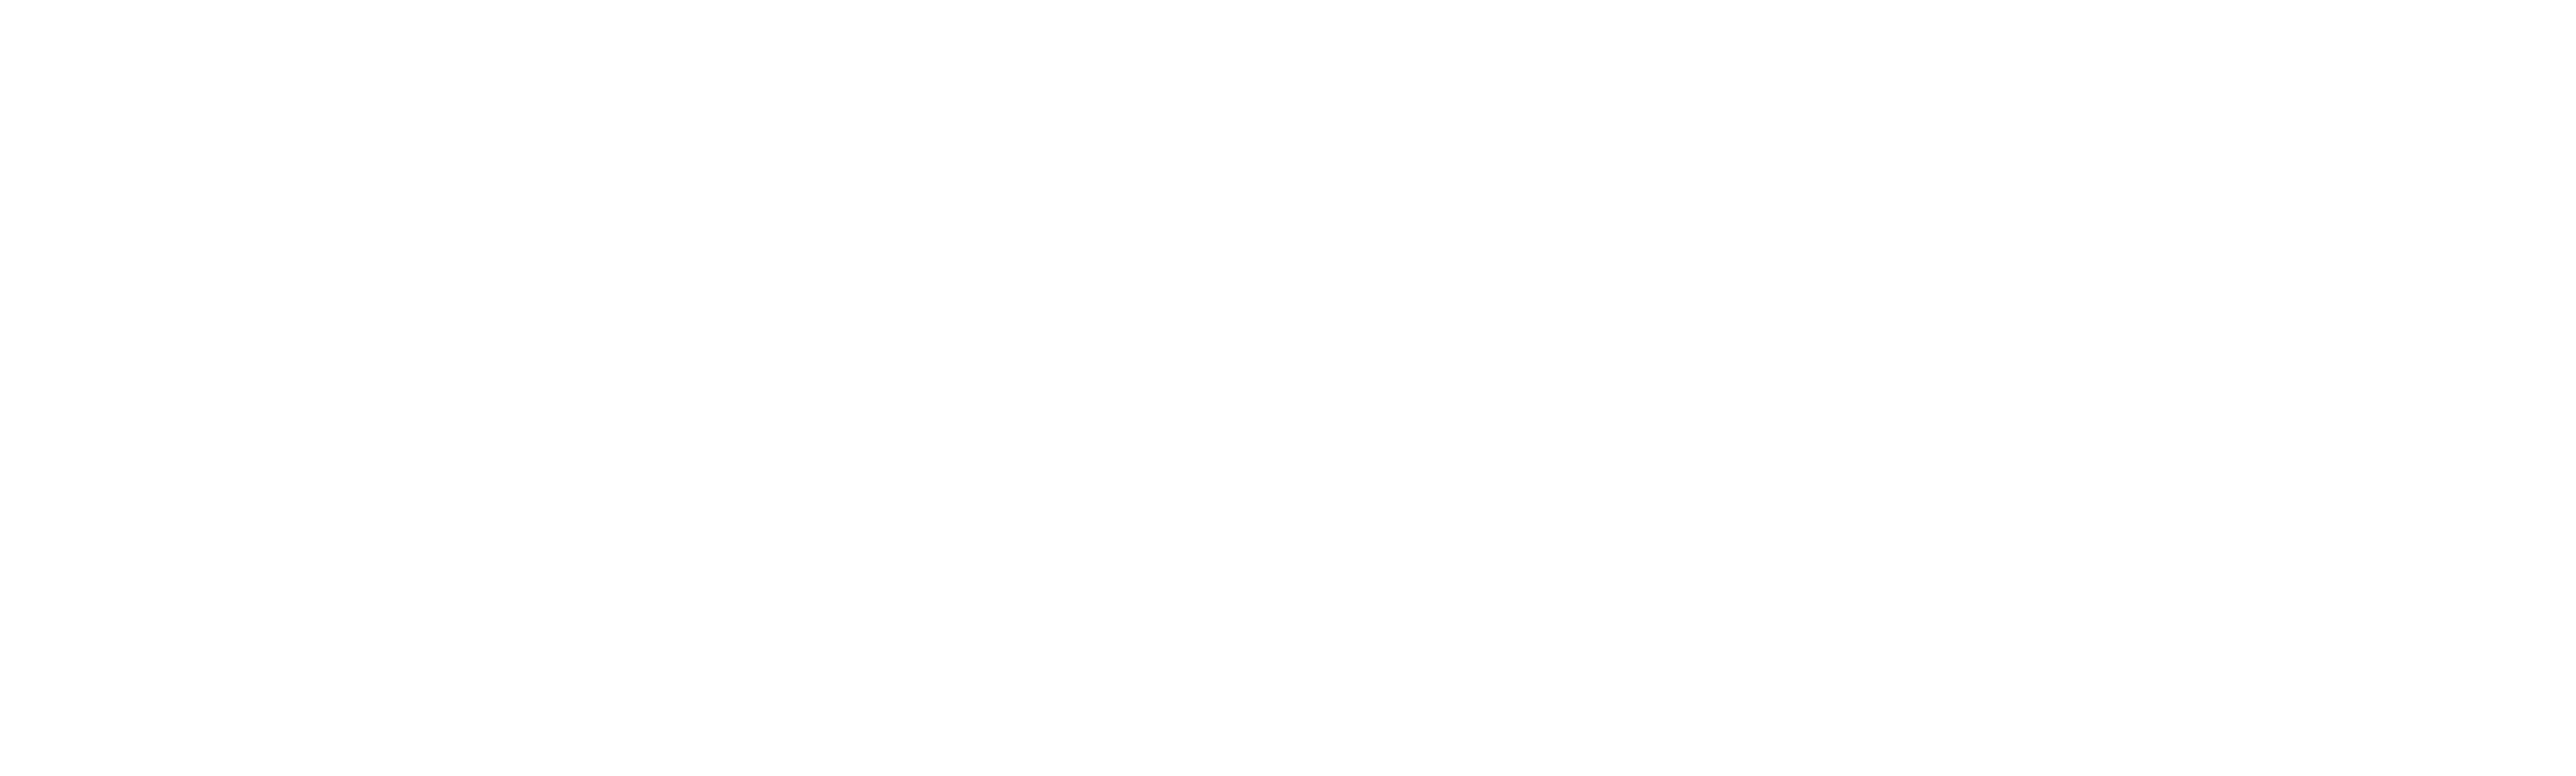 6. Iserlohner U15 Hallenmasters